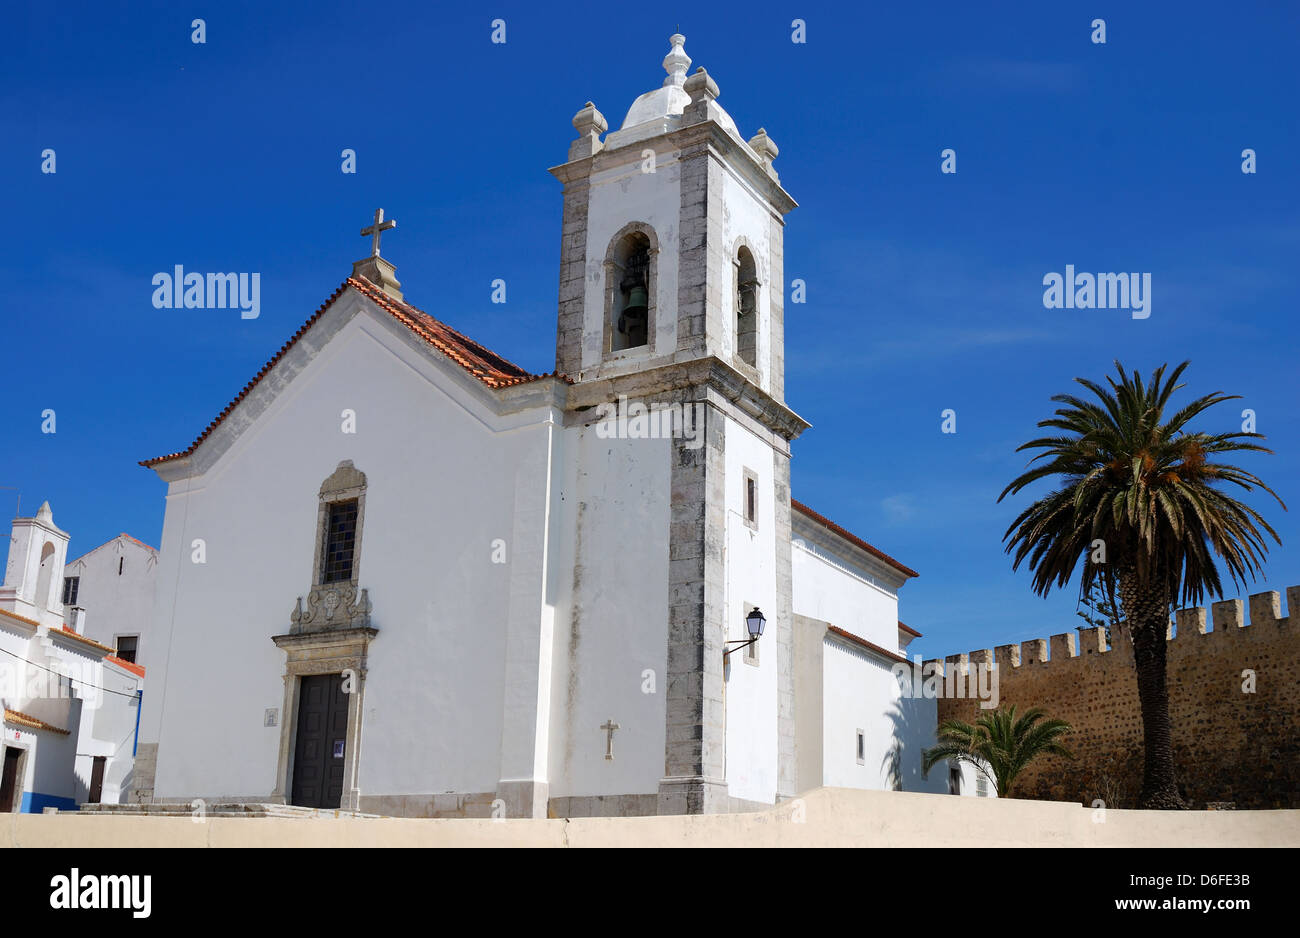 The parish church where Vasco da Gama was christened. Vasco da Gama was born in the Sines town's castle in 1469. - Stock Image